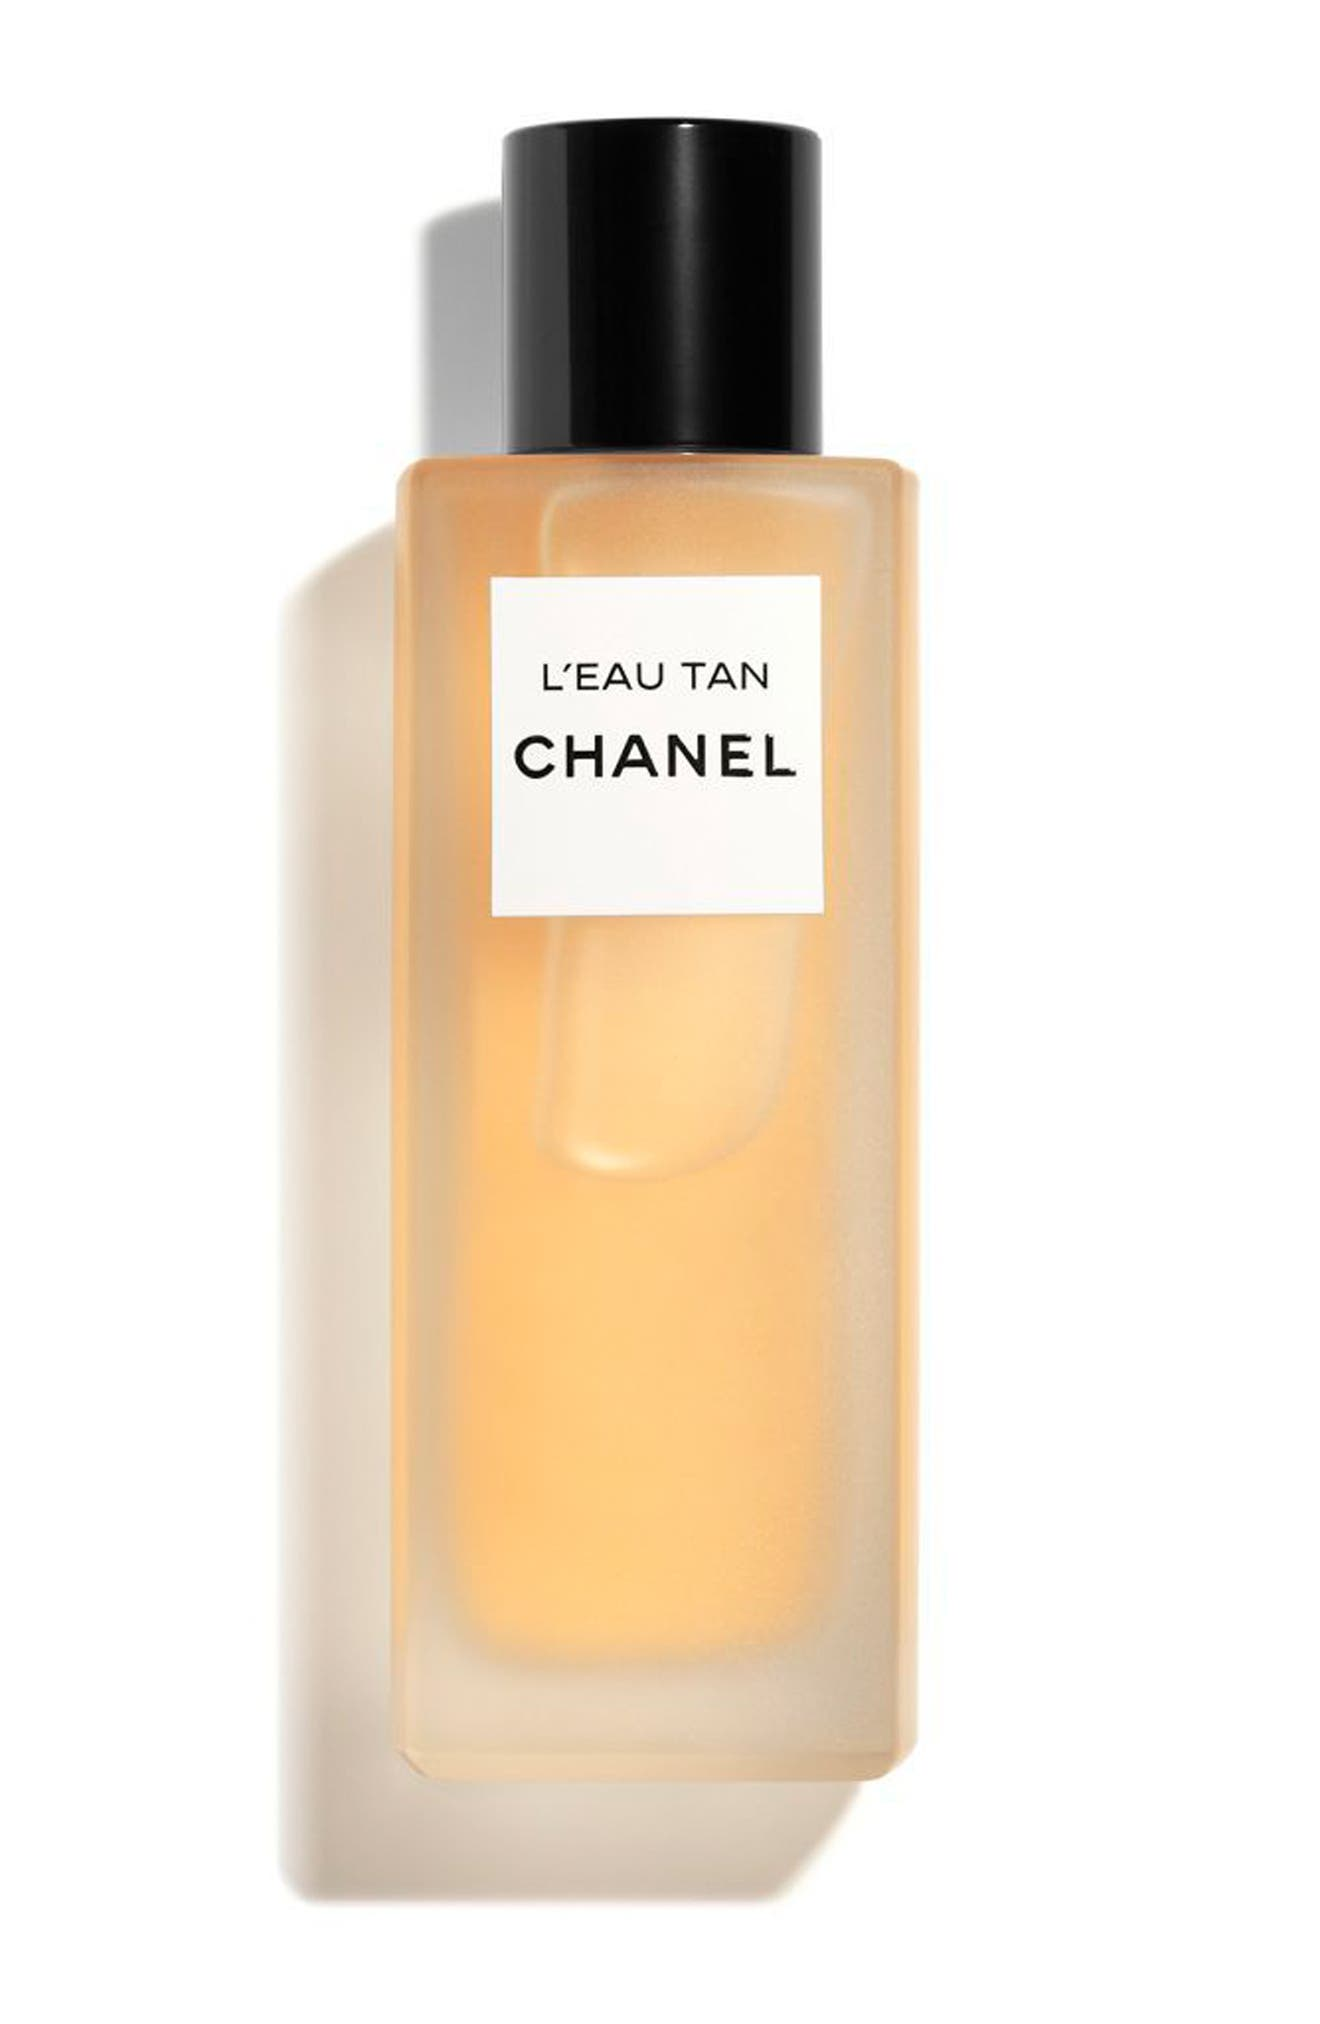 L'EAU TAN Refreshing Self-Tanning Body Mist,                             Main thumbnail 1, color,                             000